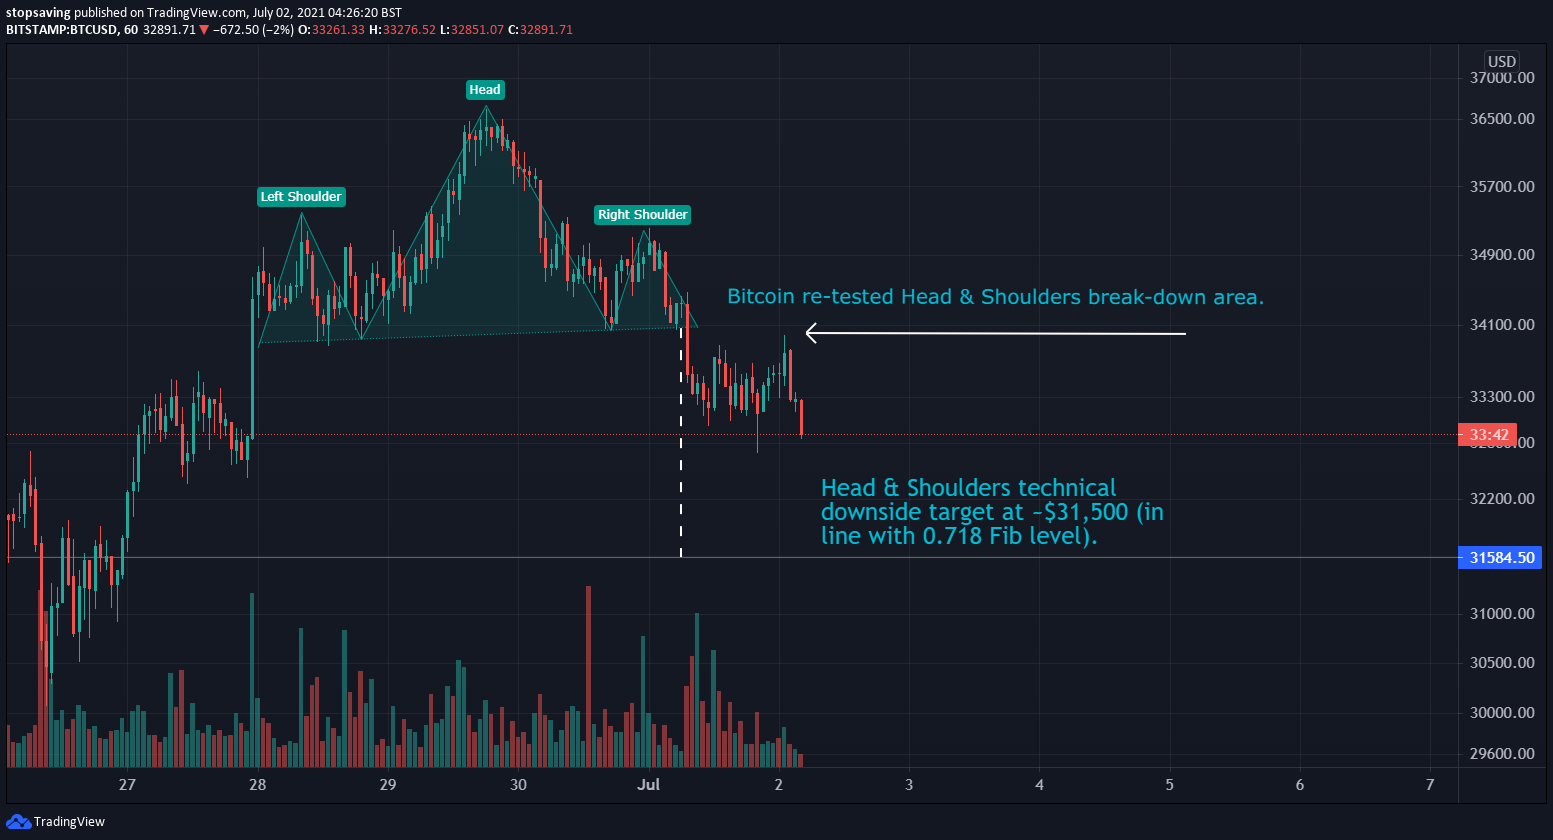 02072021 Bitcoin technical analysis 1-hour chart 02 June 2021